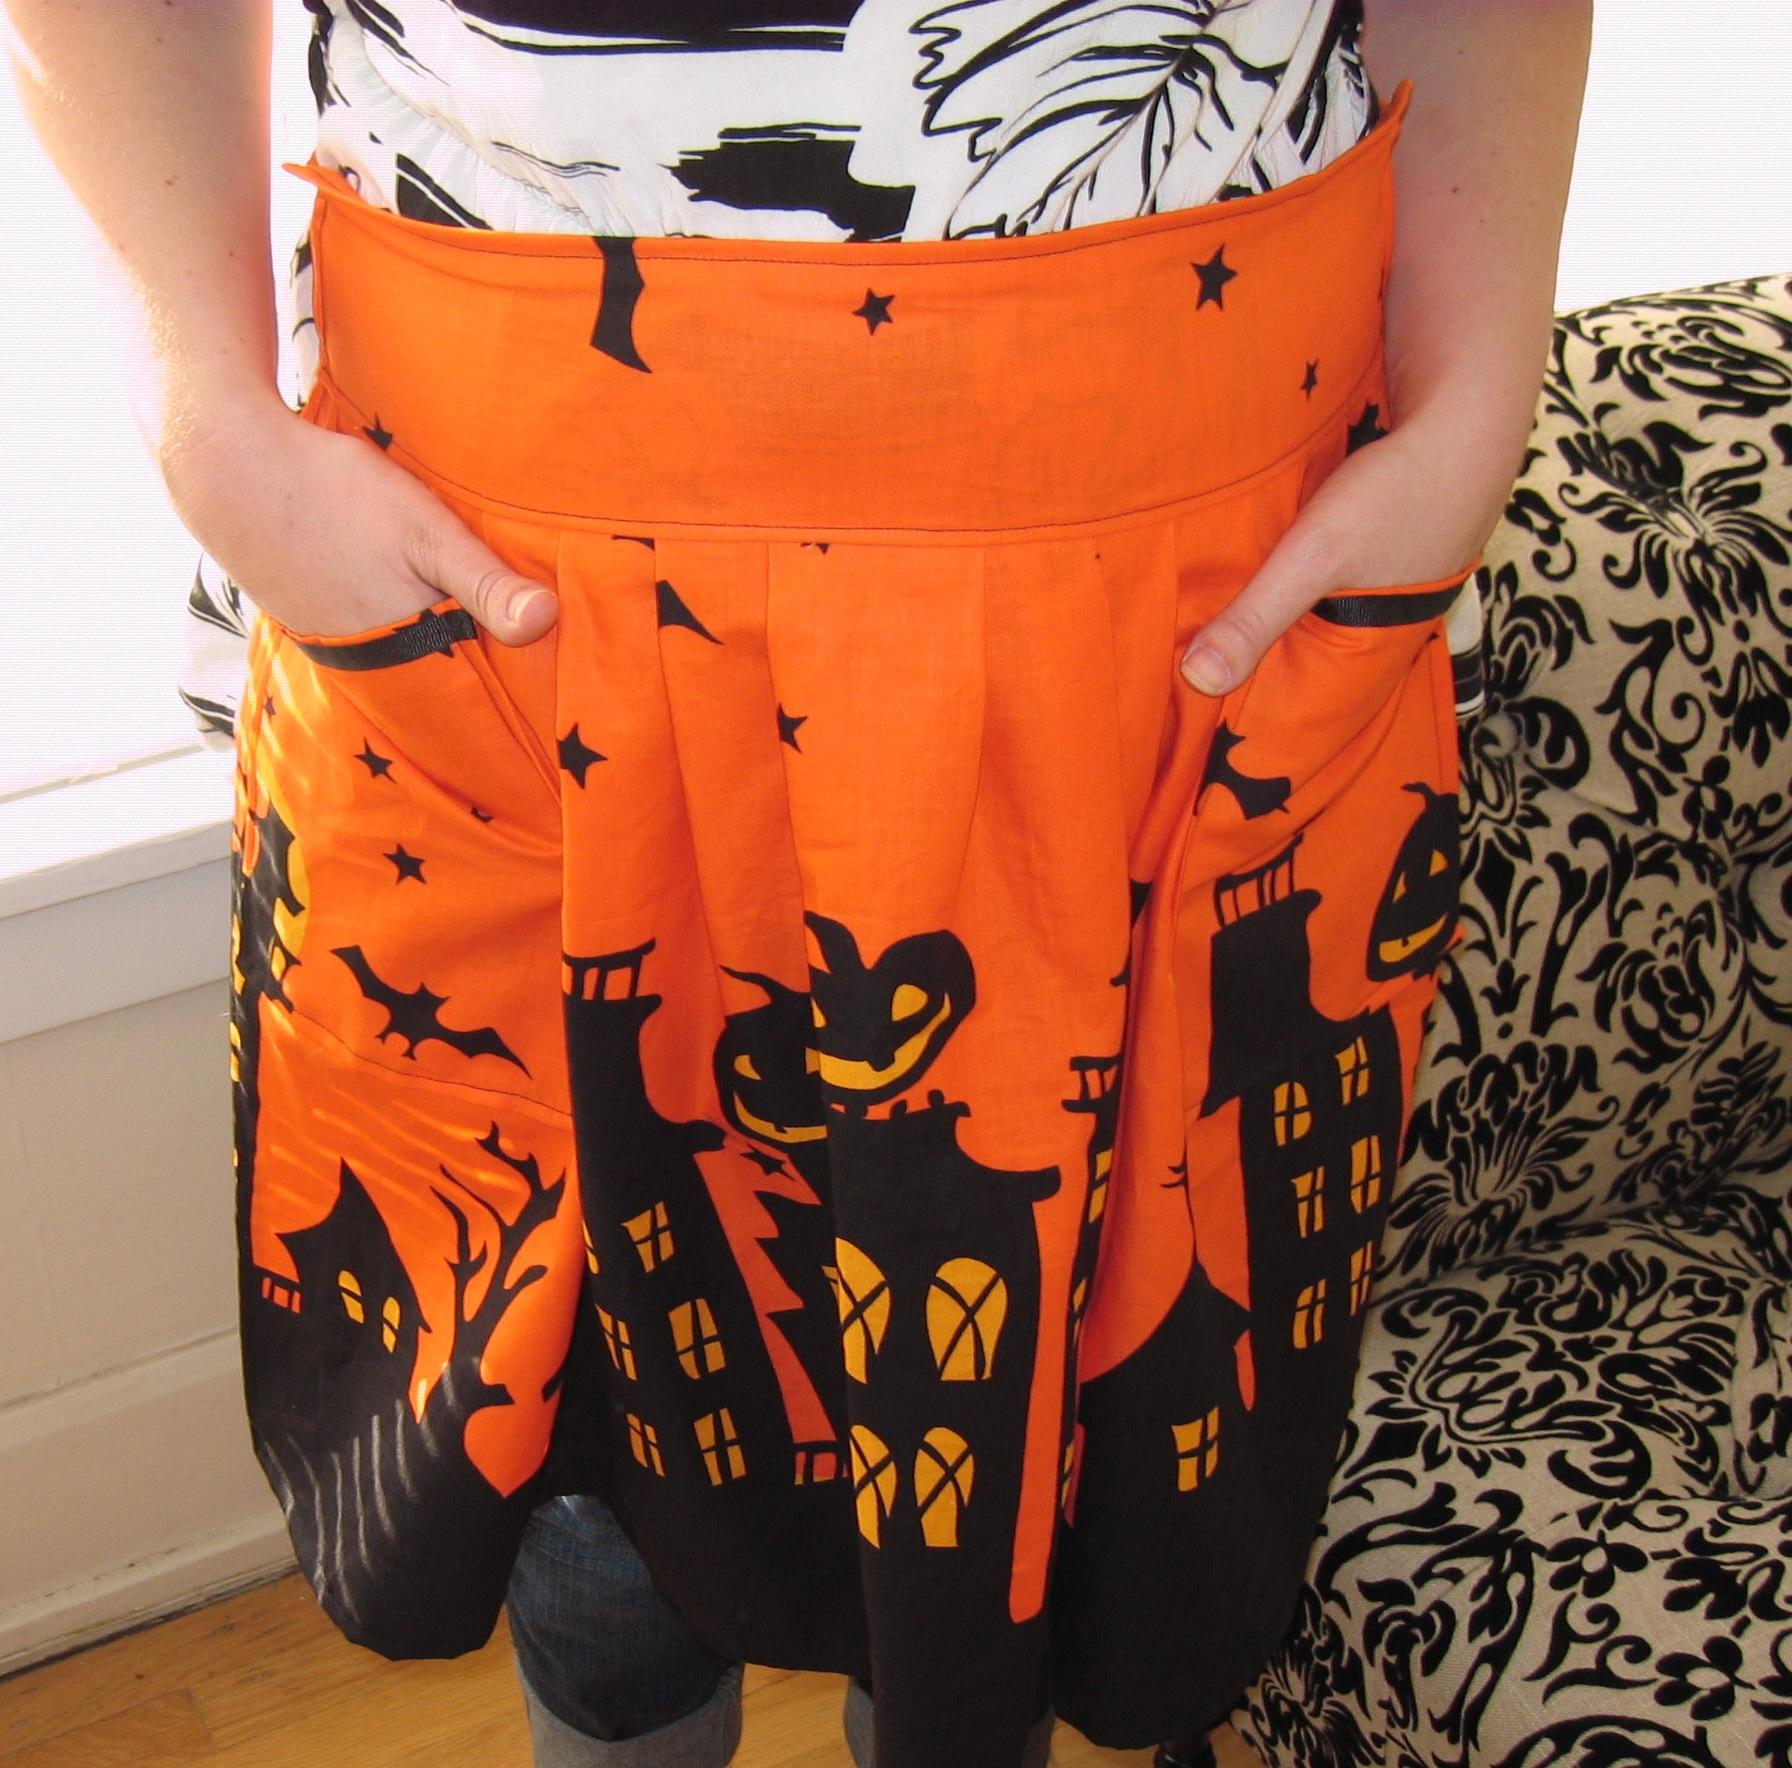 sewn halloween apron | favecrafts